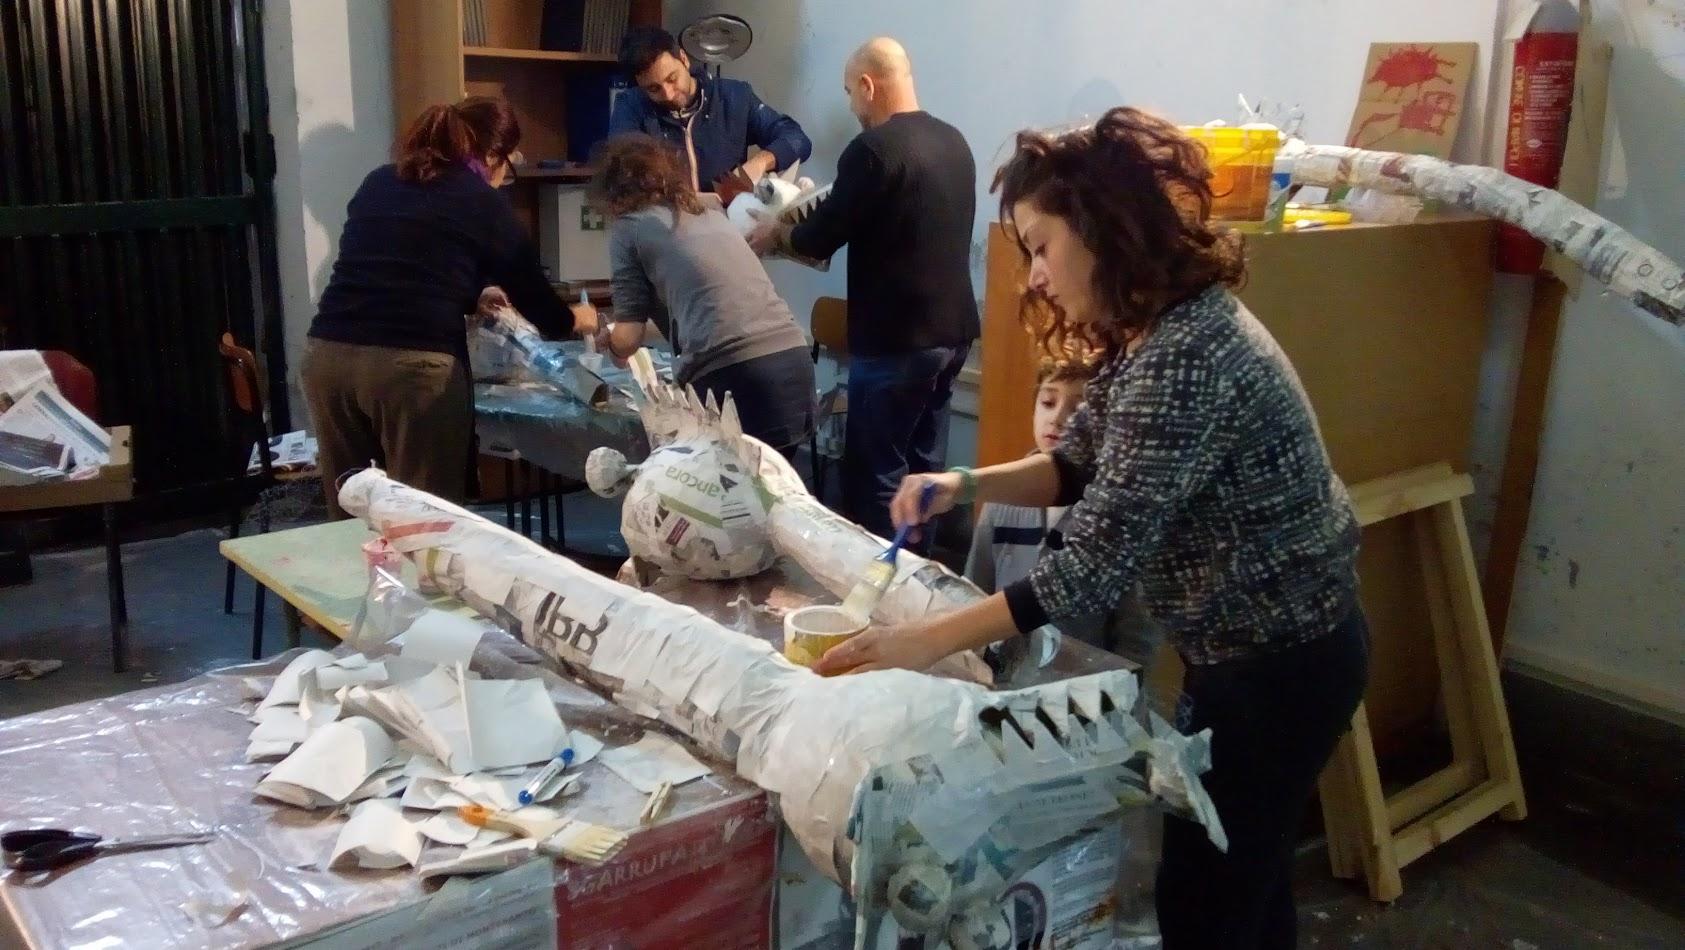 Carnival workshop at Sgarrupato, Naples, February 3, 2018